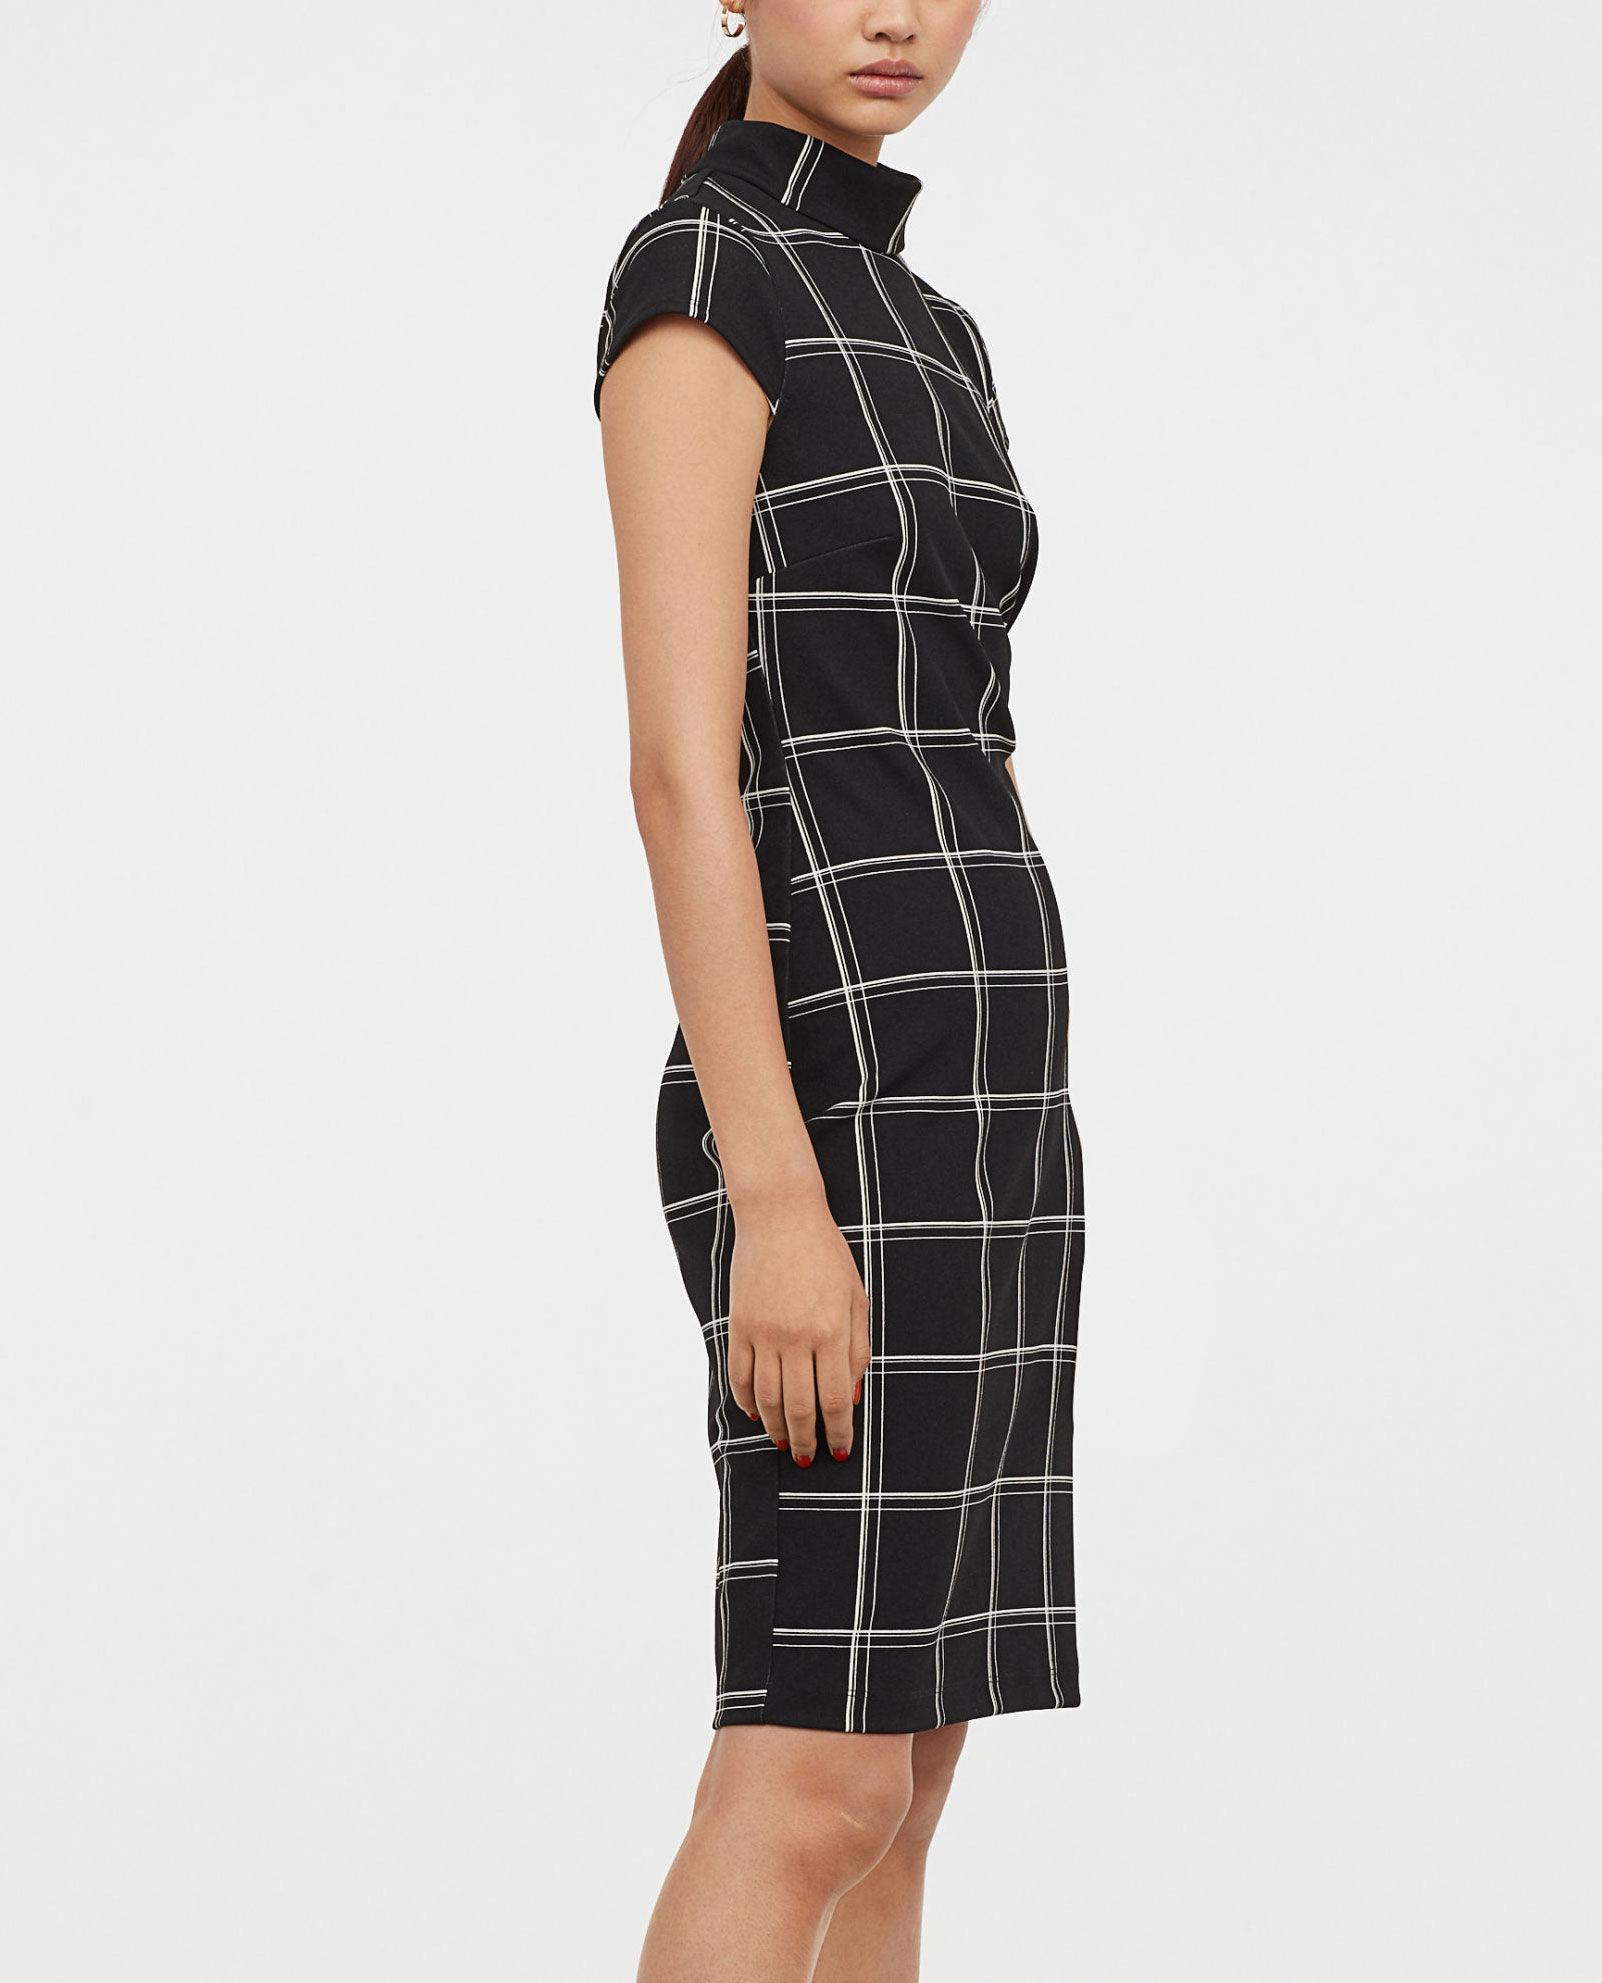 H&M Plaid Dress     $34.99